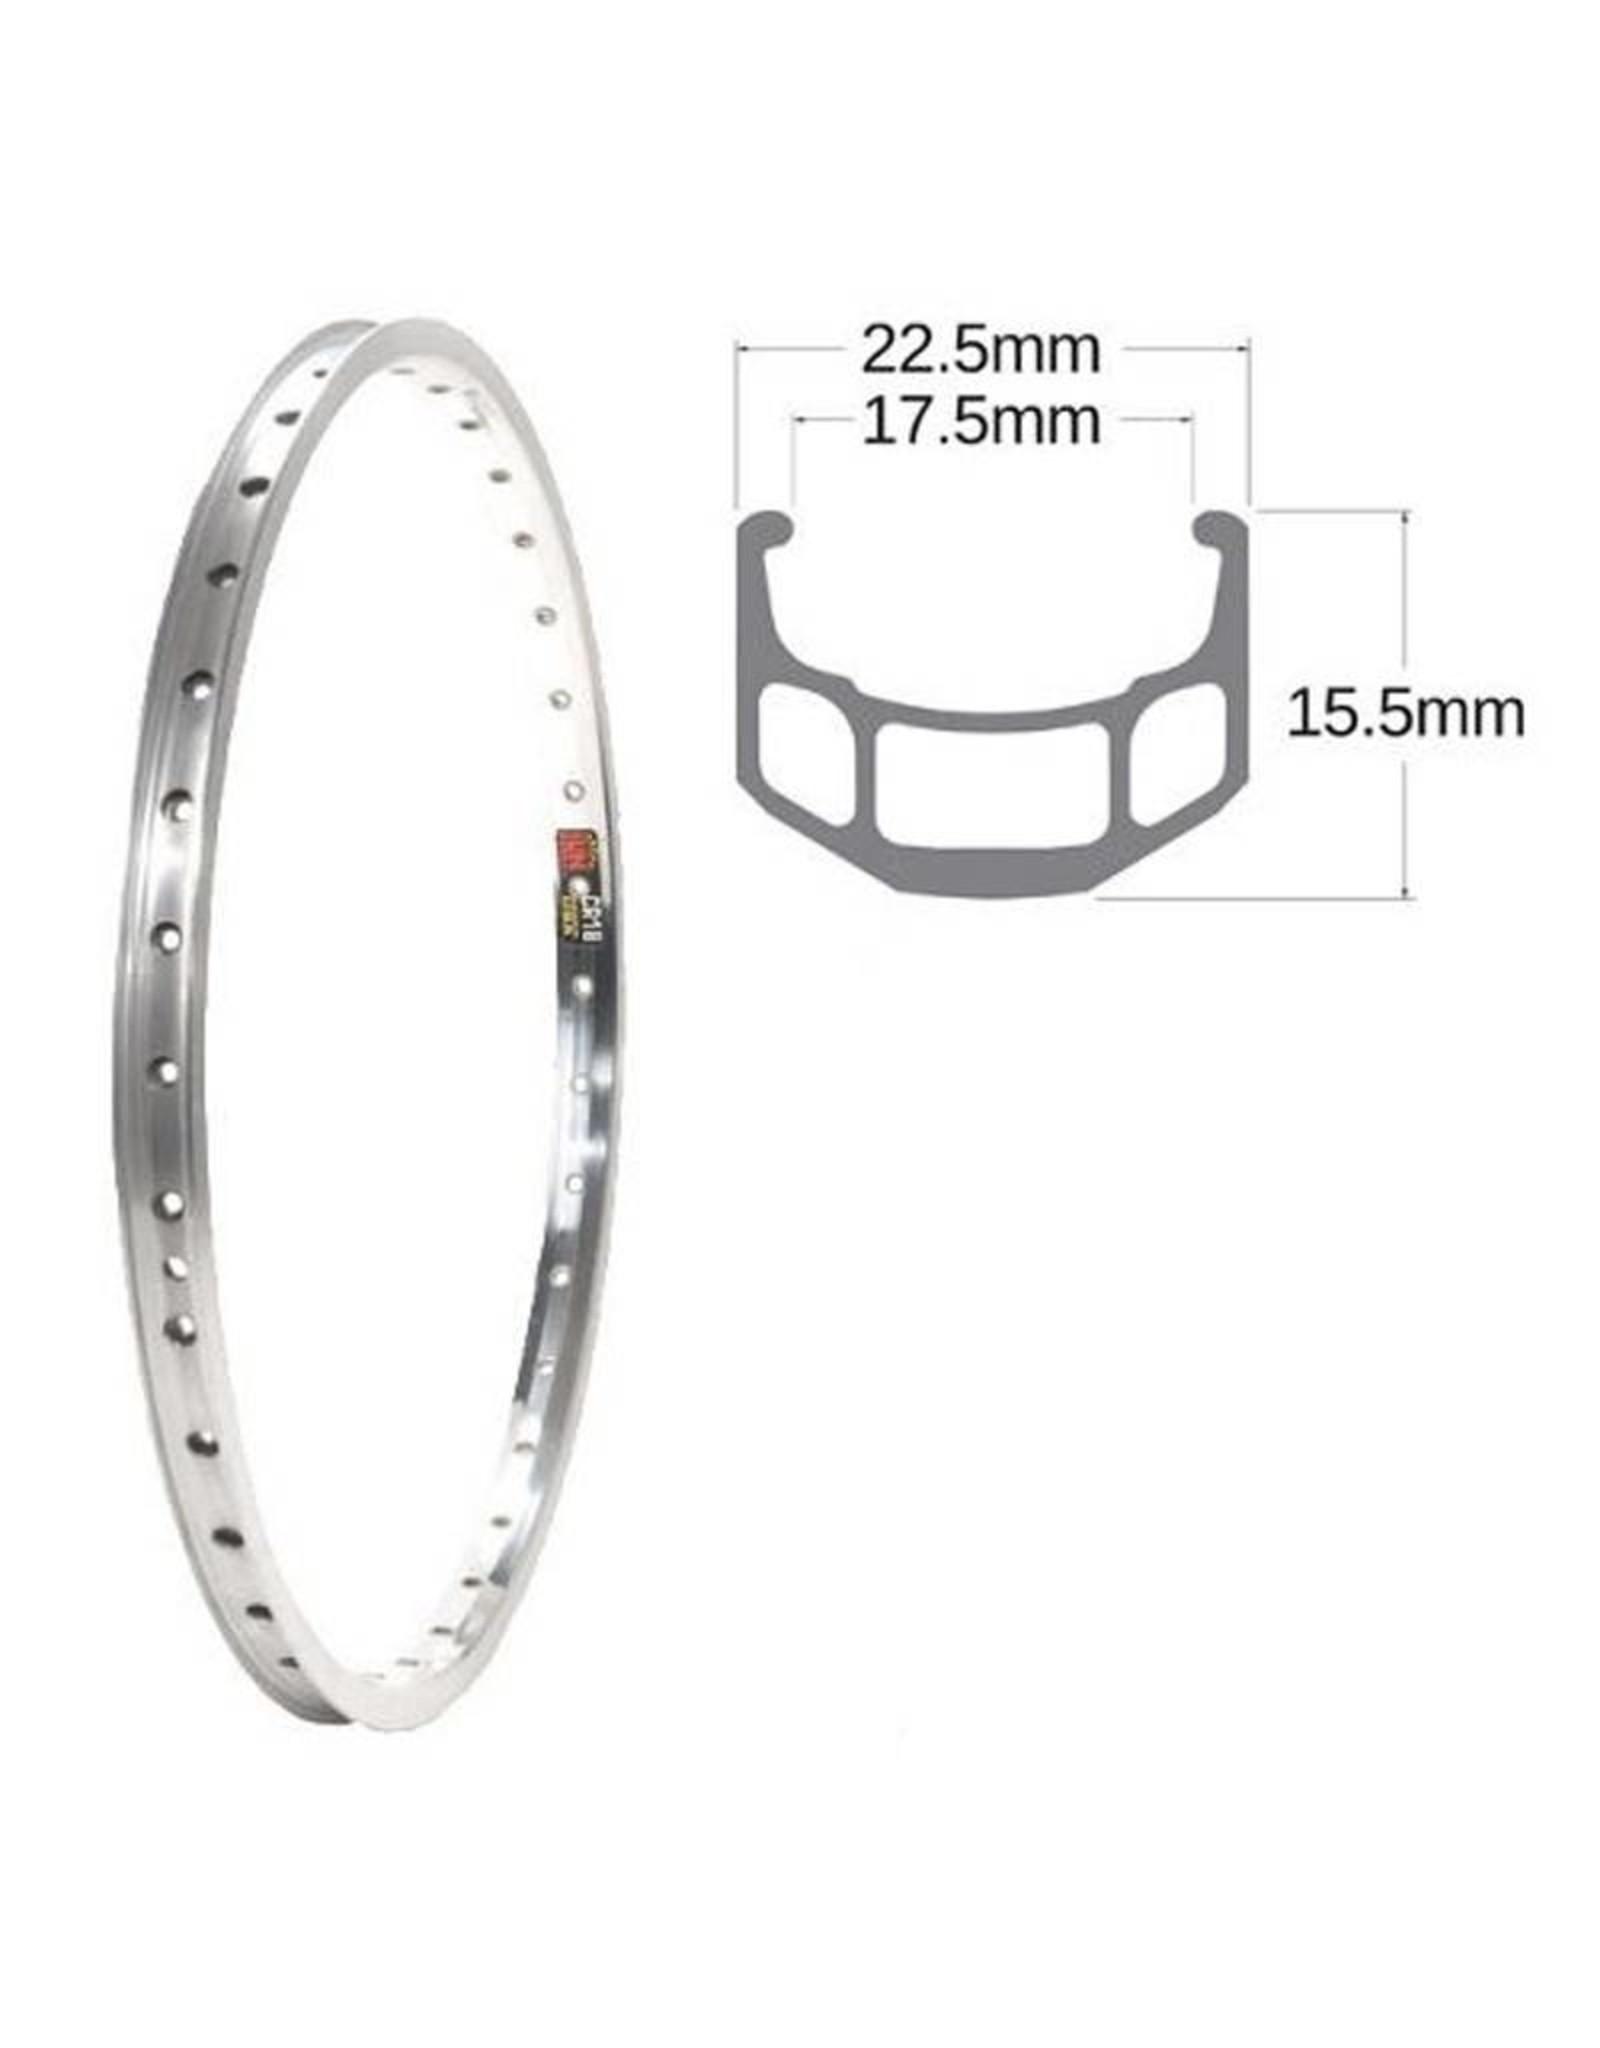 SUN RIMS Rear wheel 27x1-1 / 4 CR18 FW NUT